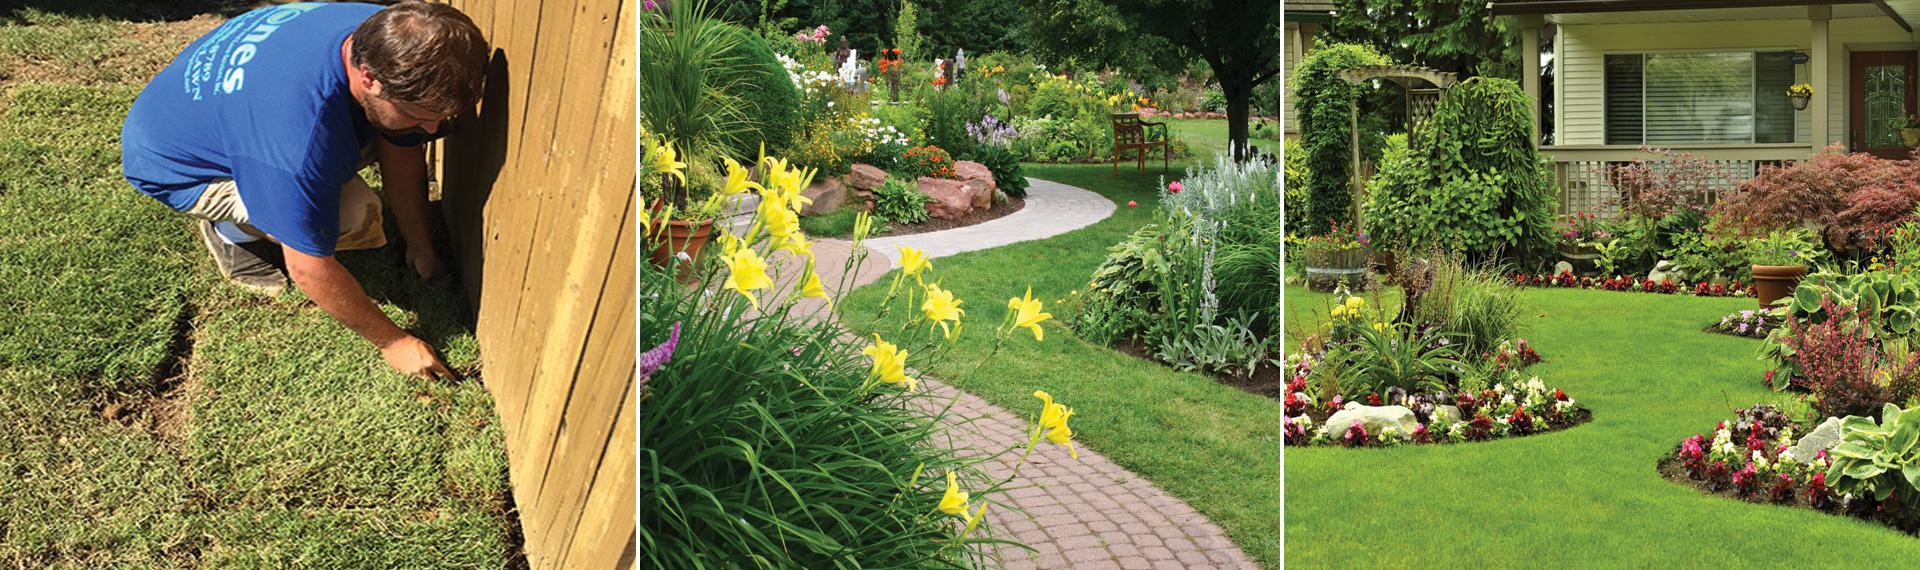 Jones Landscaping & Lawn Services INC East End AR